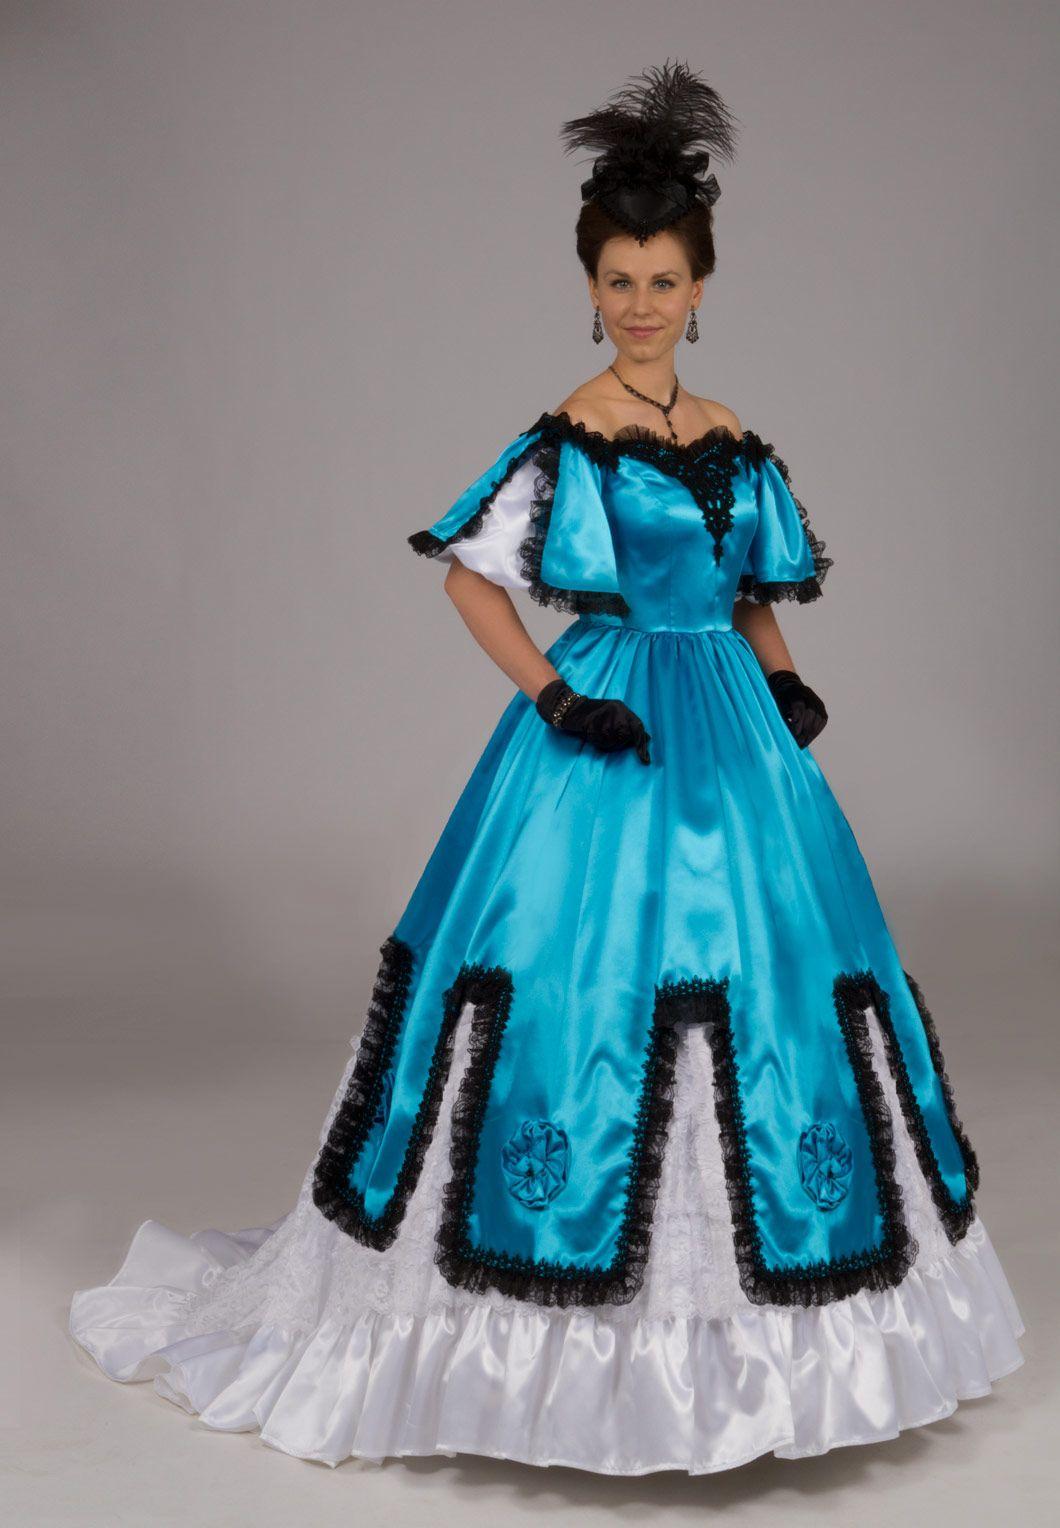 Satin Victorian Ball Gown | Victorian Evening | Pinterest ...